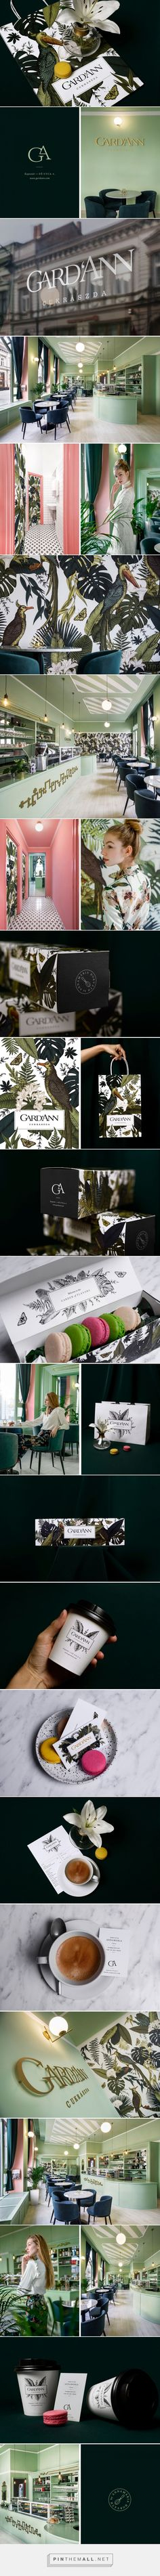 Gard'Ann Patisserie Branding by Kissmiklos